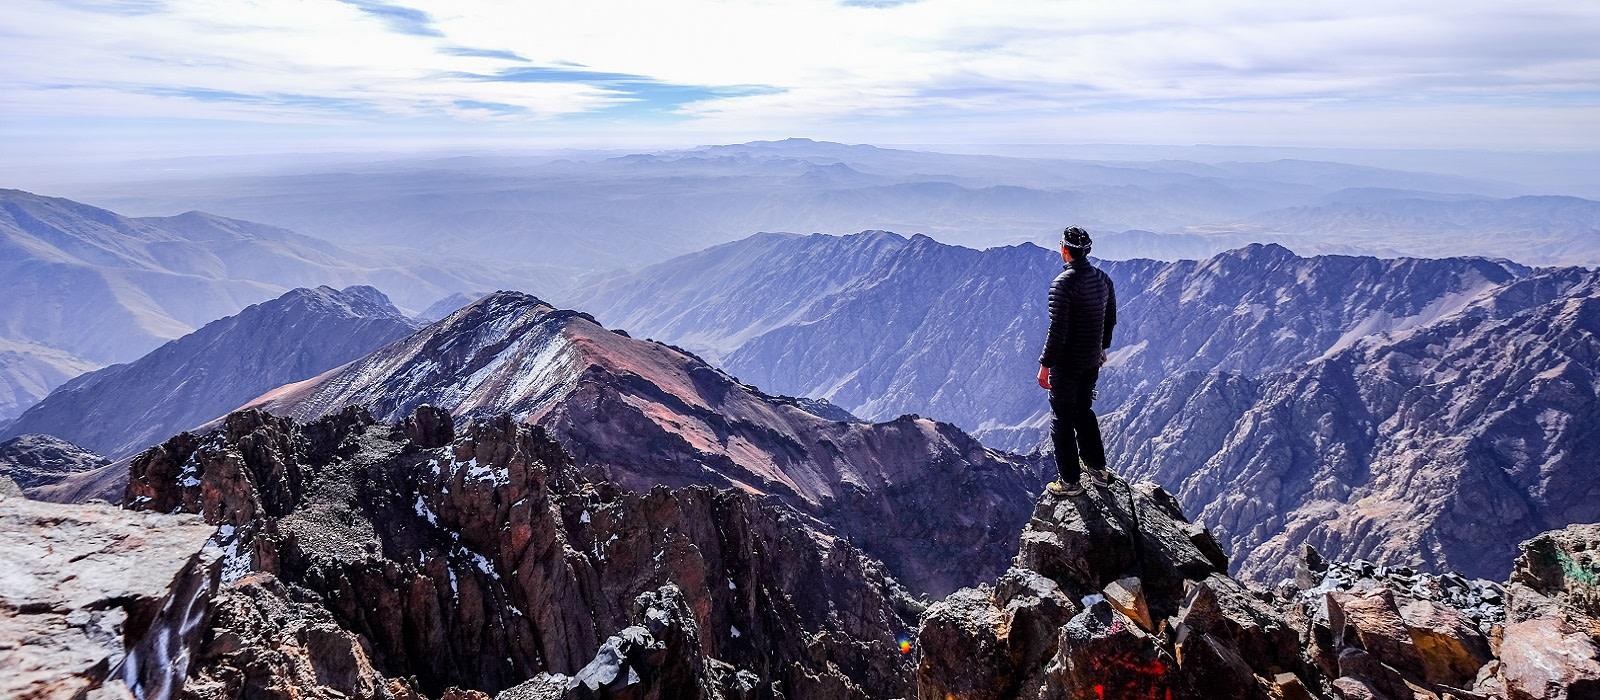 Reiseziel Atlas-Gebirge Marokko